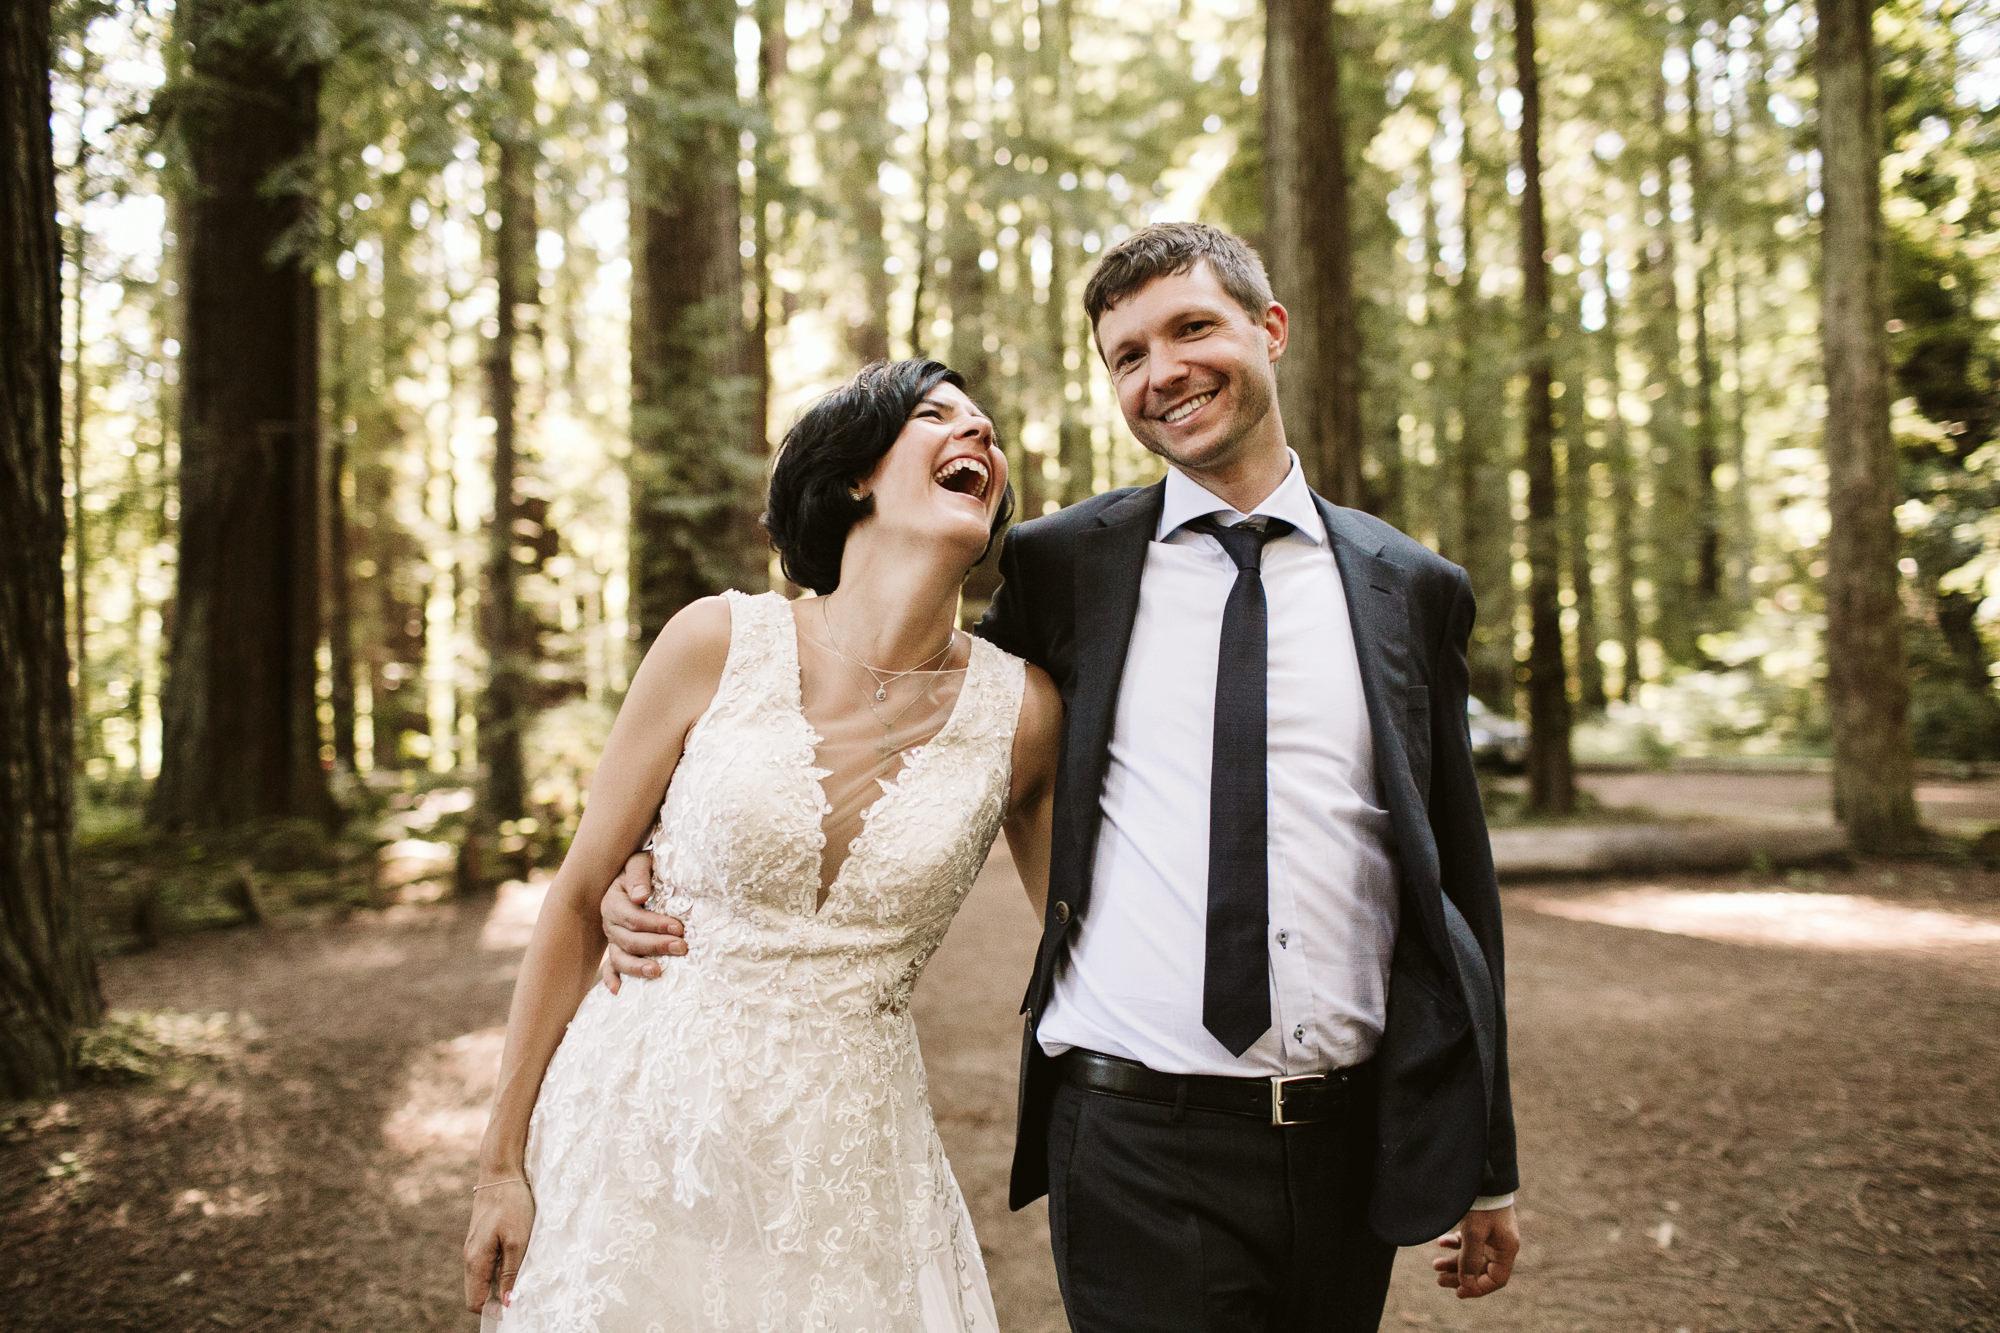 California-wedding-photographer-alfonso-flores-pamplin-groove-285.jpg